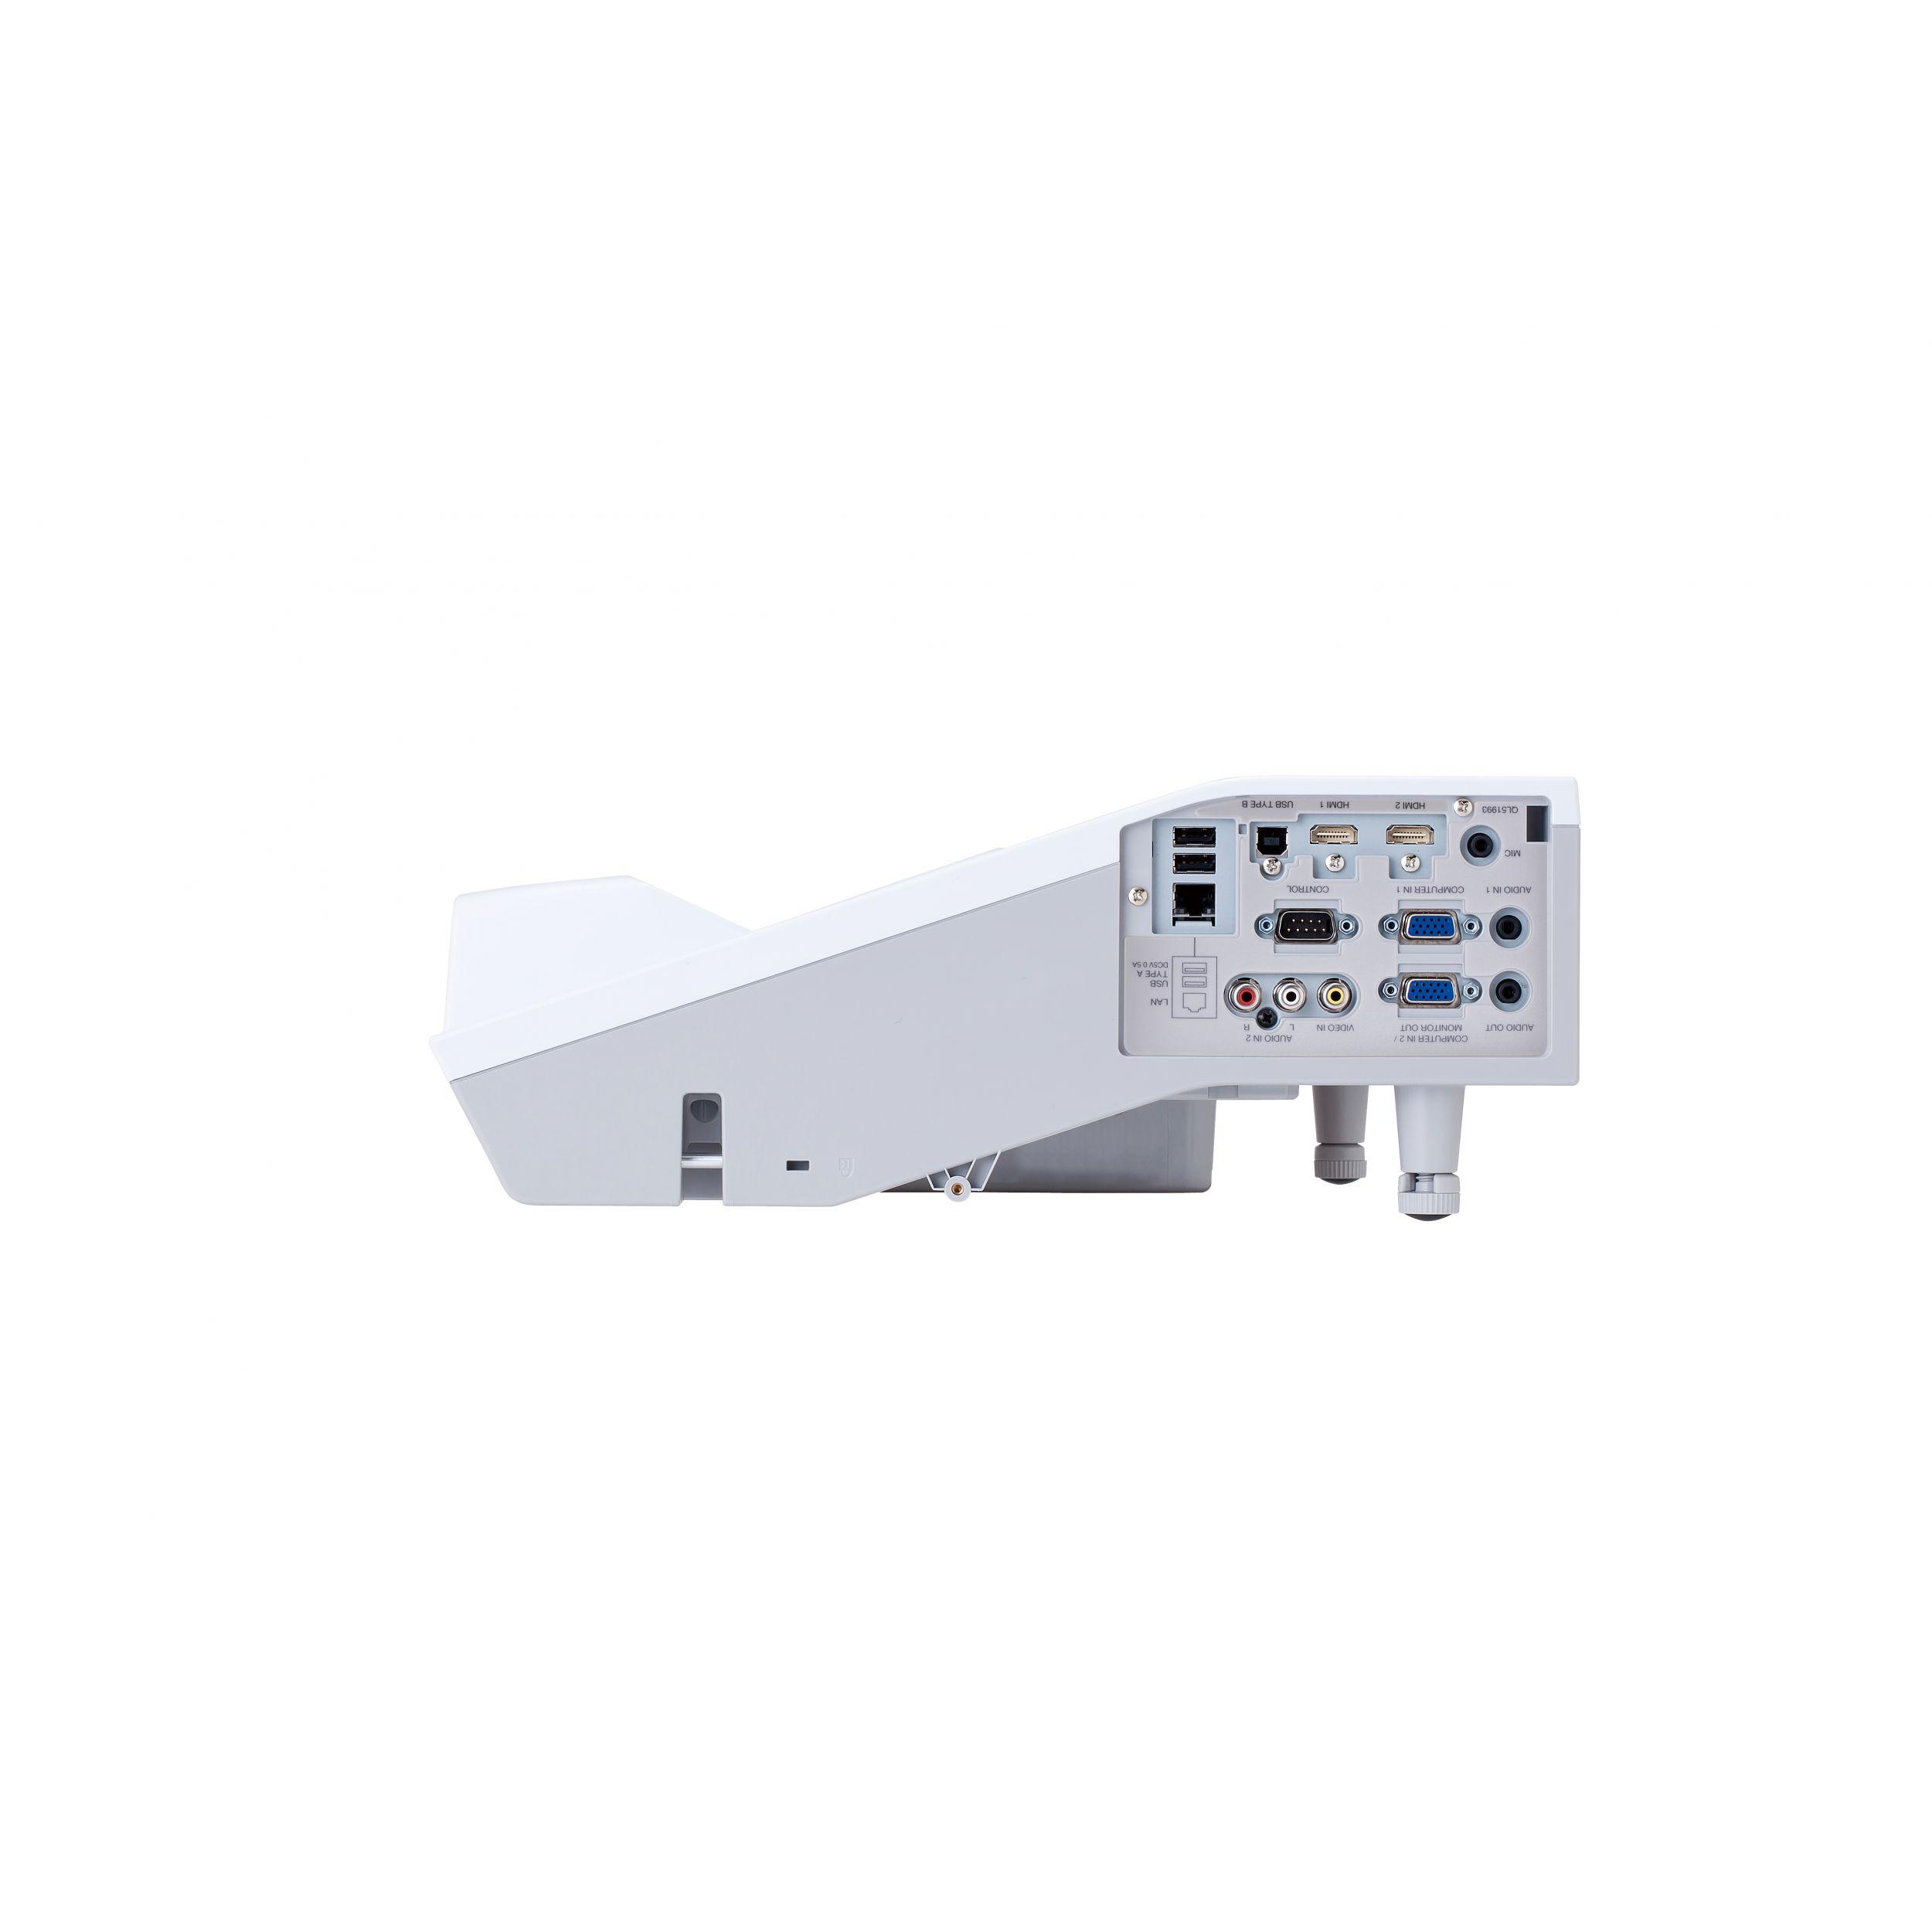 projektor hitachi CP-AW2505 o ultrakrótkiej ogniskowekj